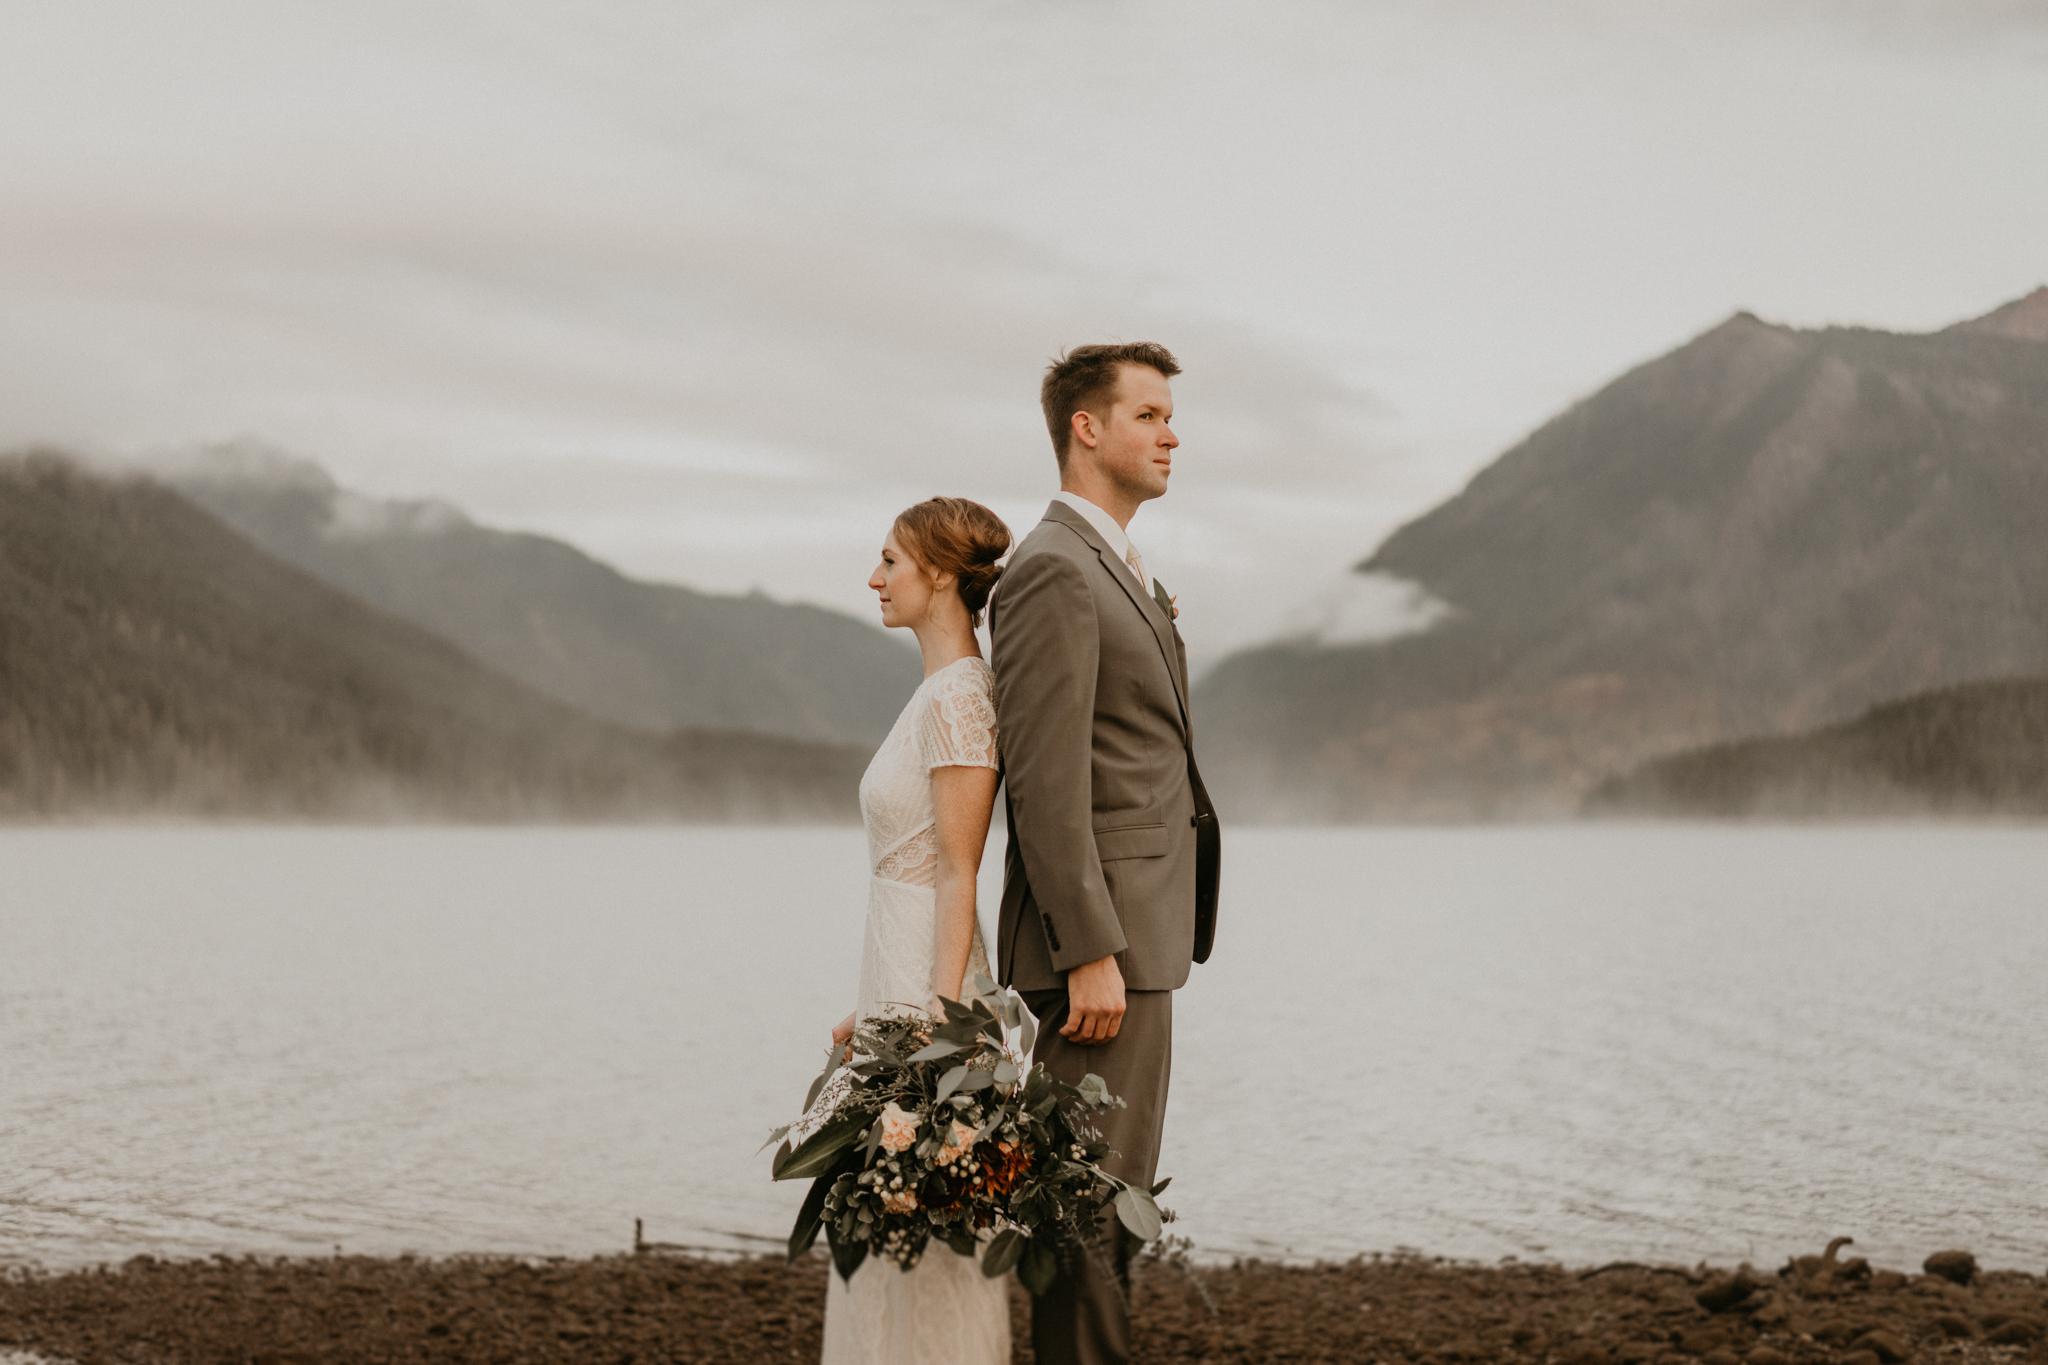 Lake-Cushman-Wedding-Elopement-Engagement-Seattle-Washington-PNW-Adventure-Nature-Photographer-9.jpg